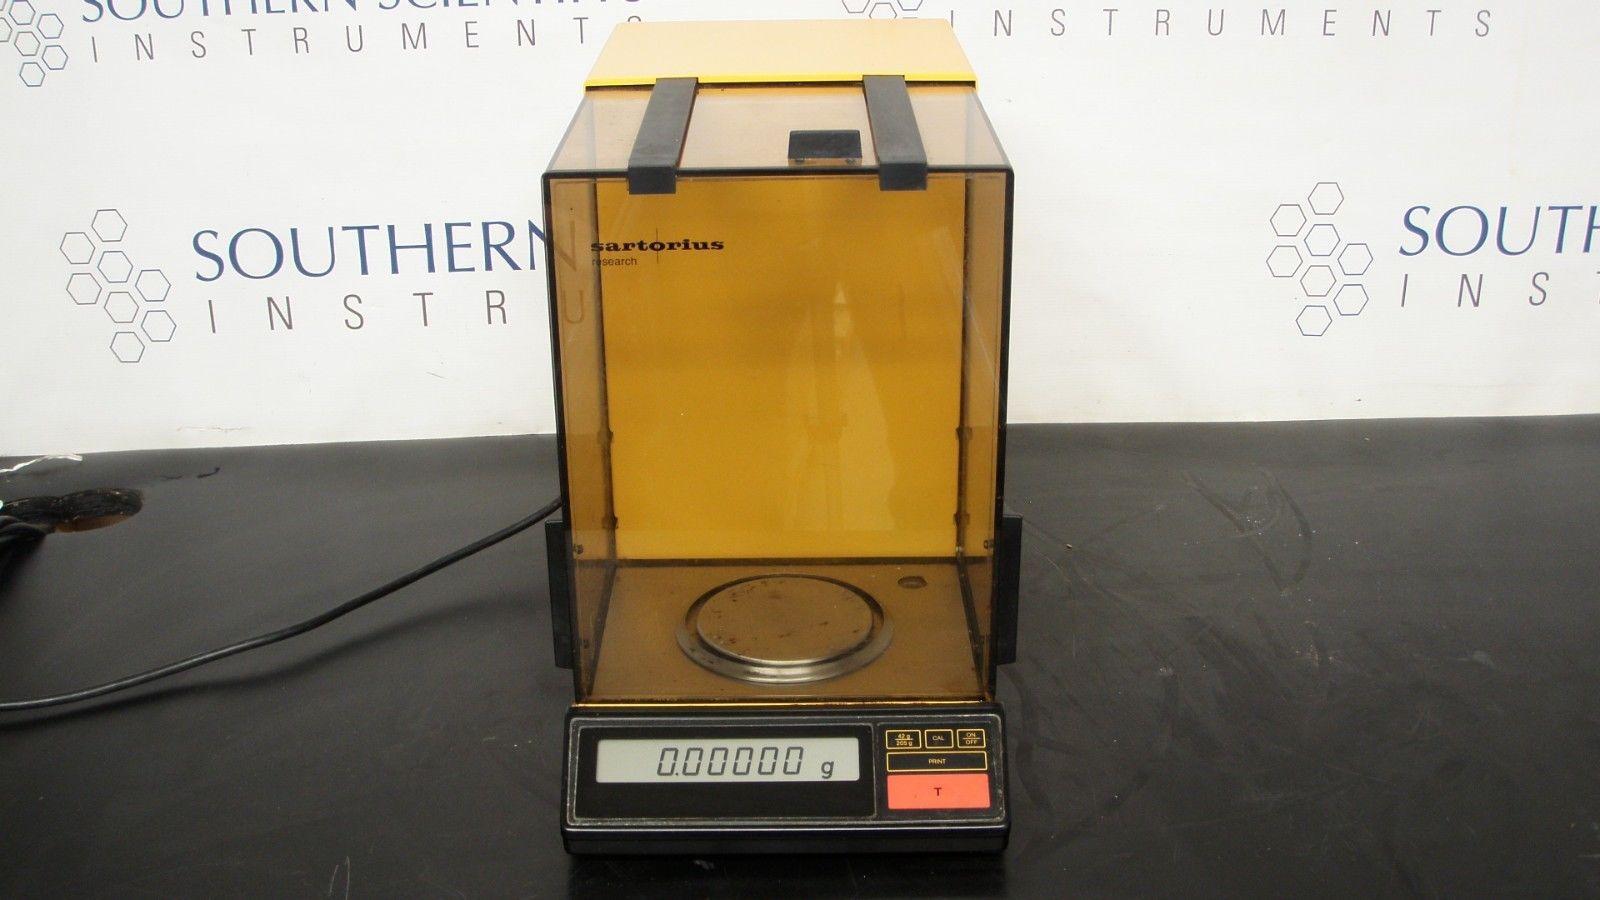 Sartorius Research Analytical Balance Model R200 D